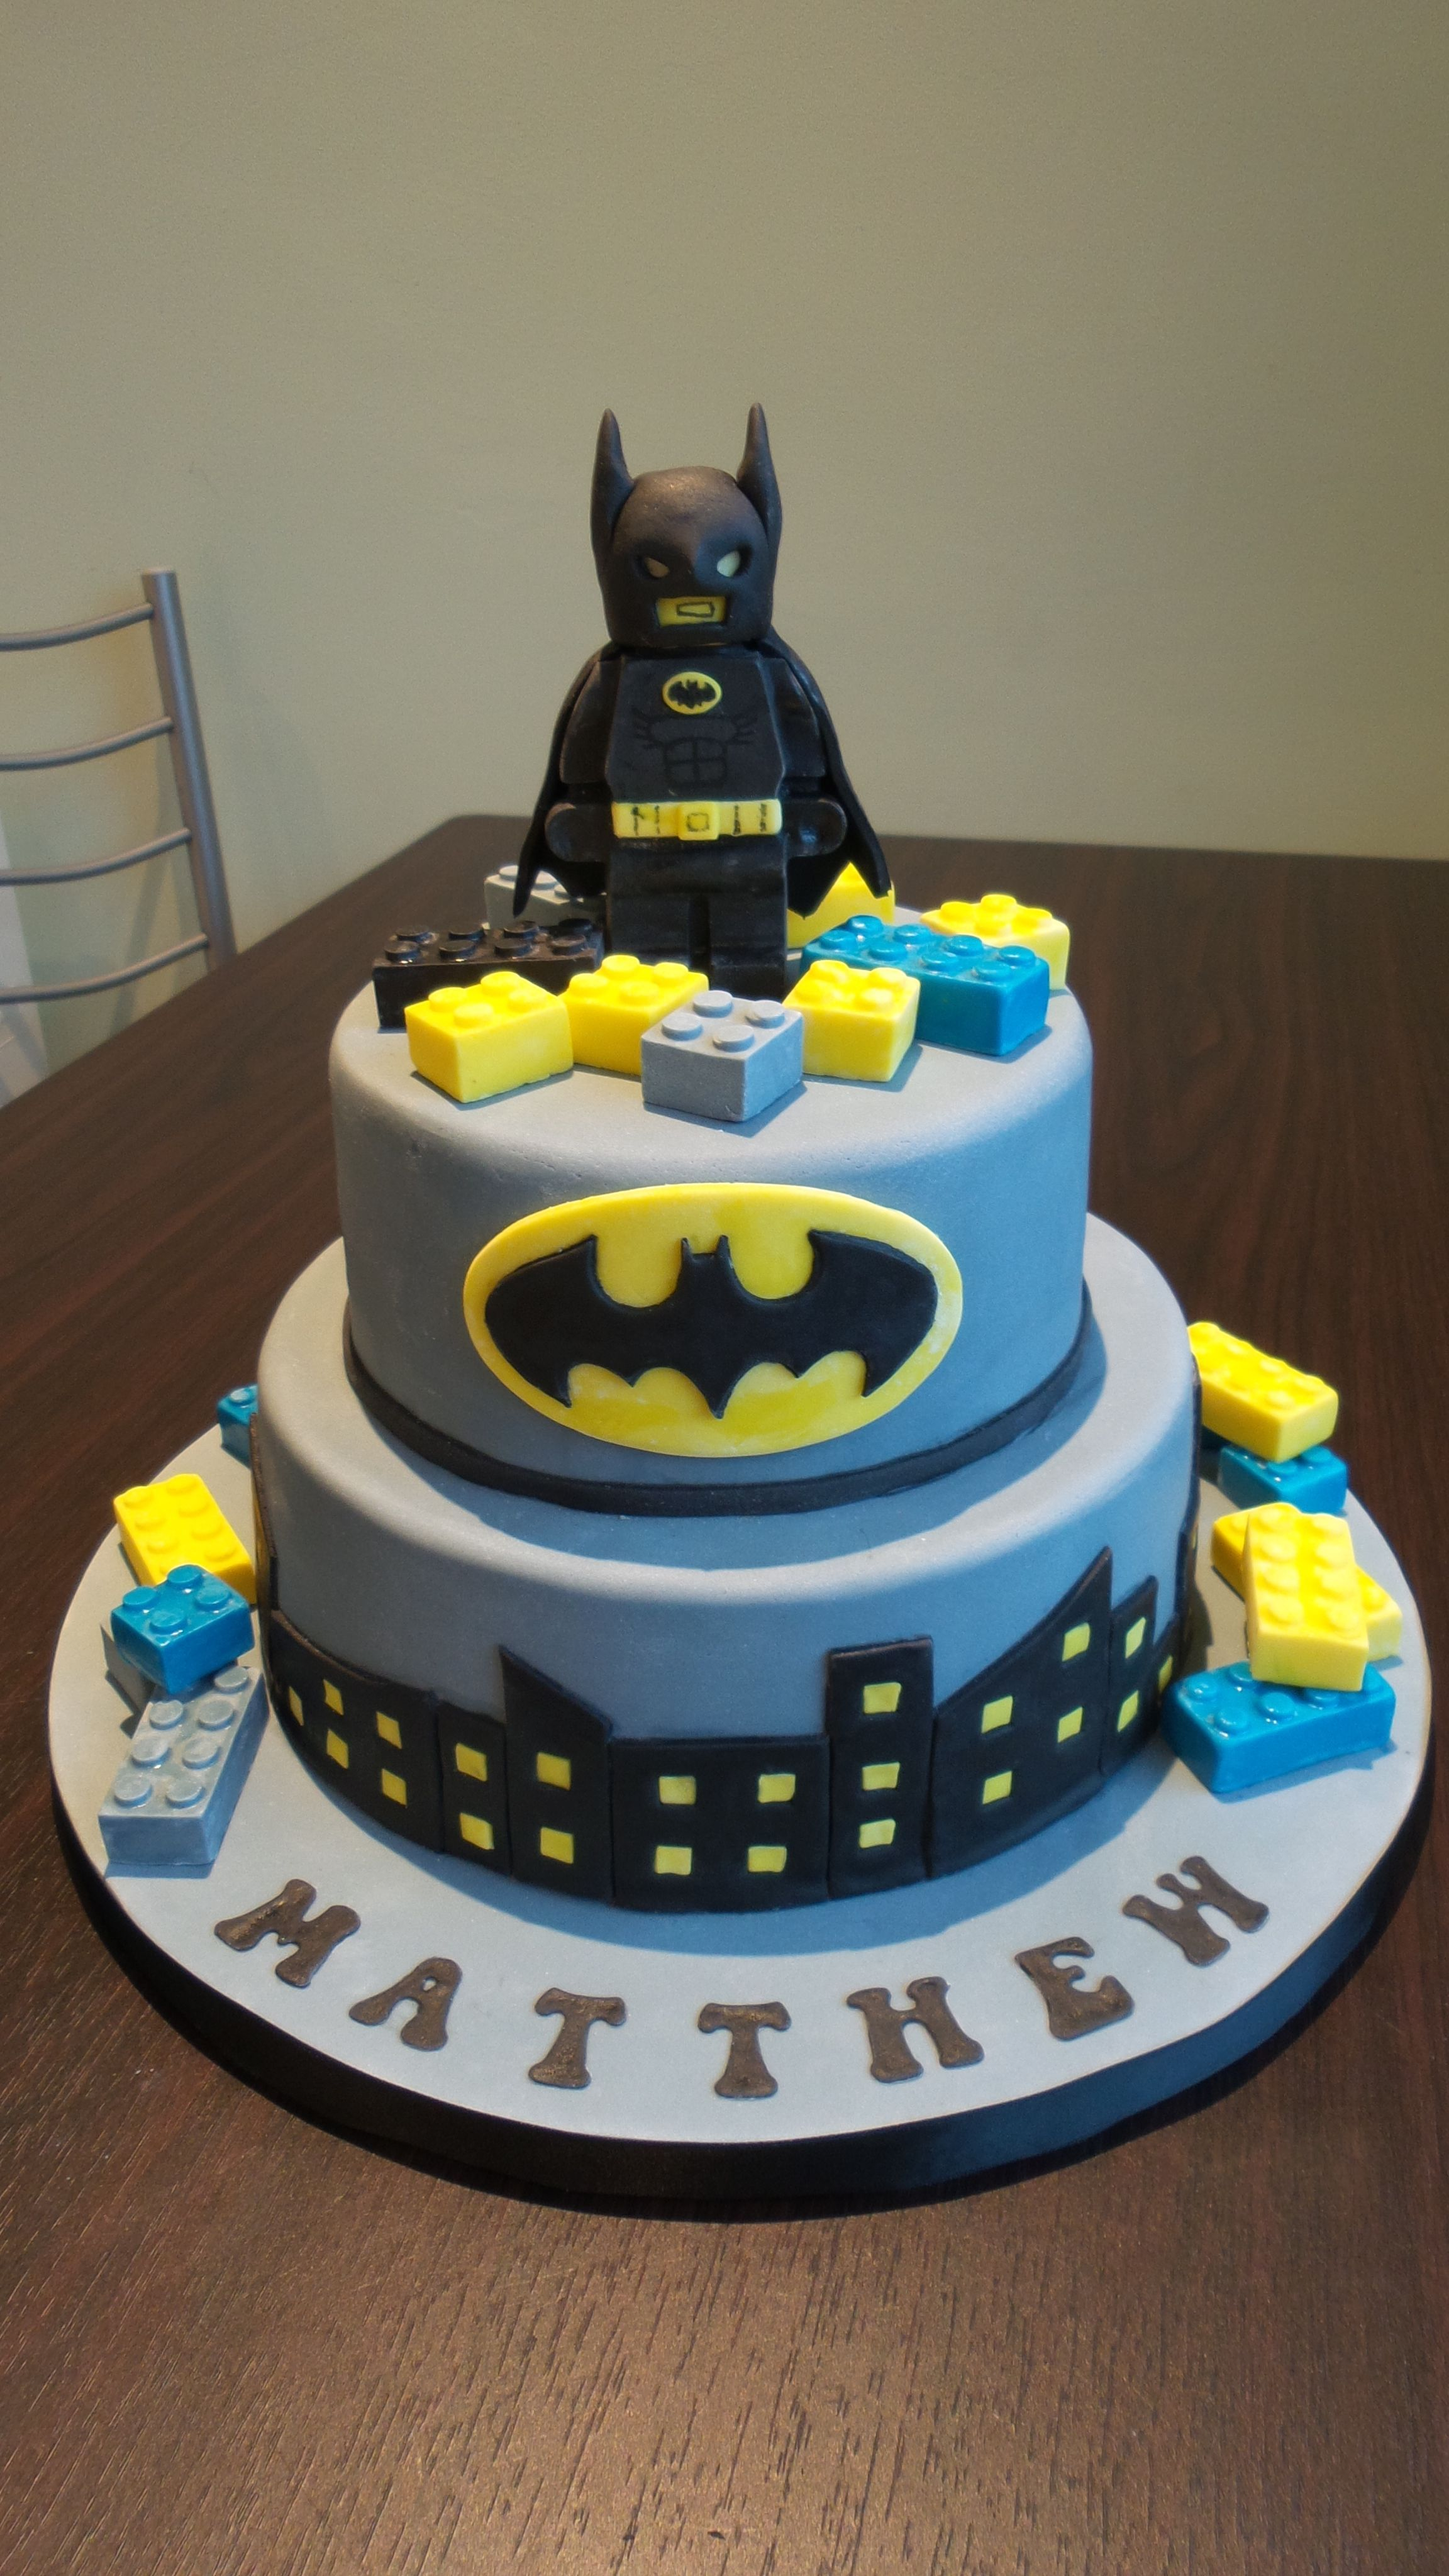 Lego Batman Cake  Pinteres - Lego batman birthday cake